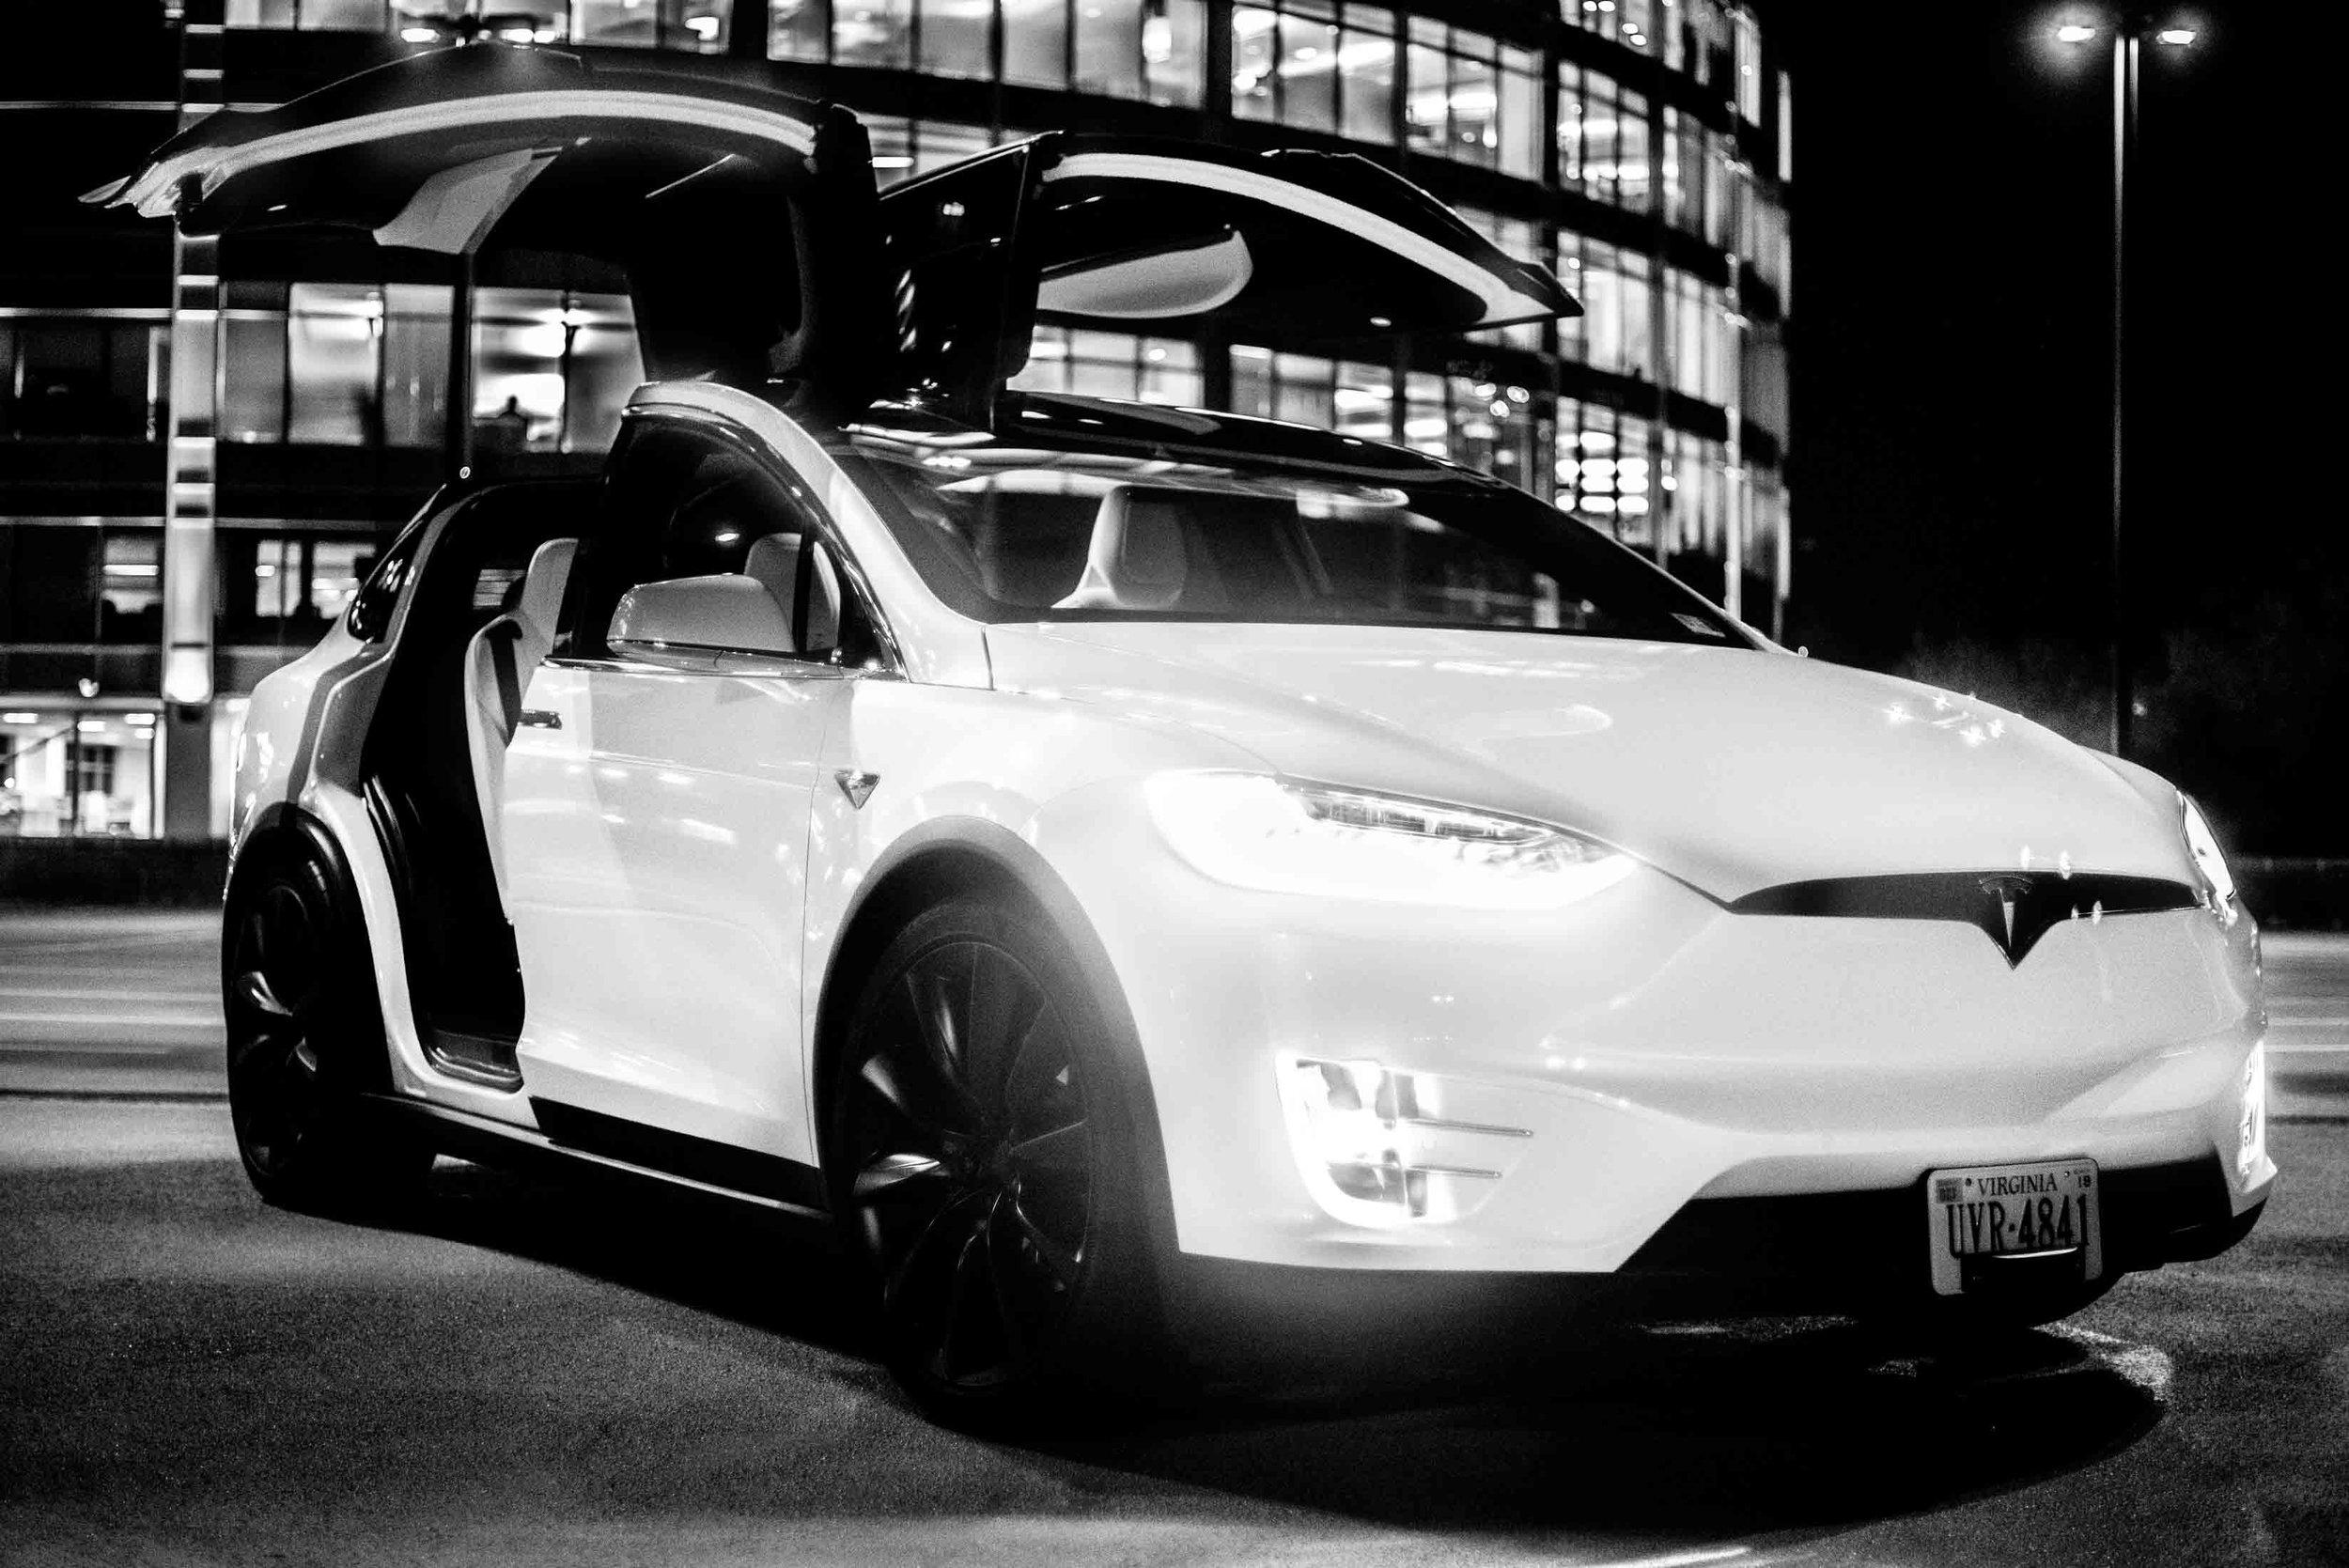 fleet+vehicle+sexy+car+photo+video+speed+tesla+p100d+vadym+guliuk+photography-9.jpg